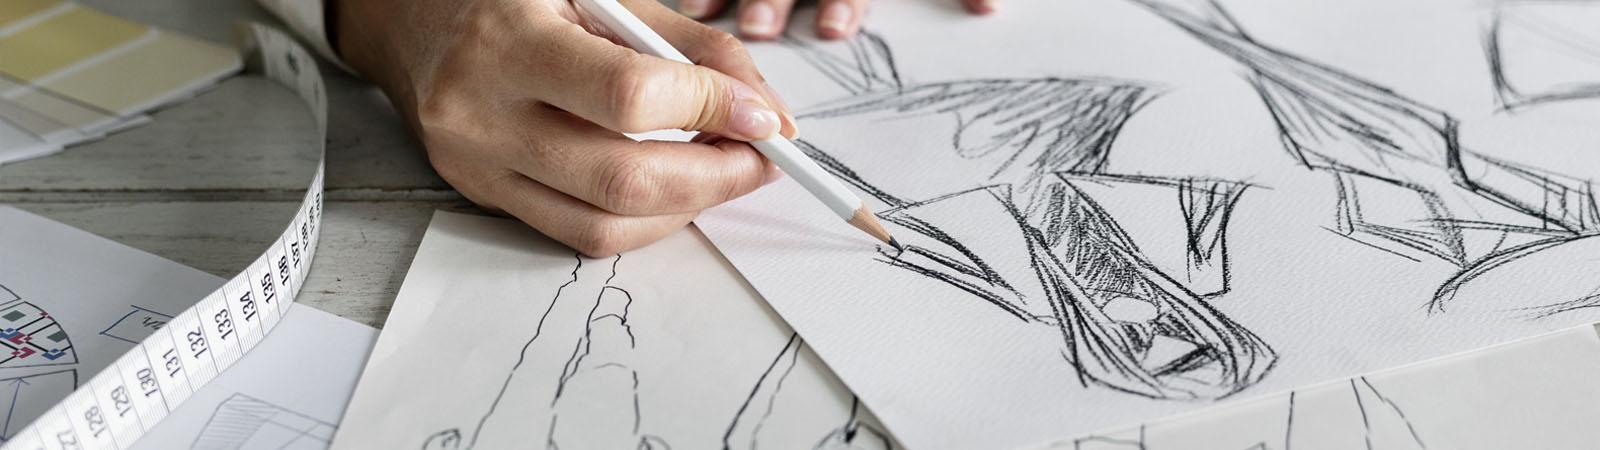 Cursos De Desenho De Moda Online Conheca 6 Opcoes Digitale Textil